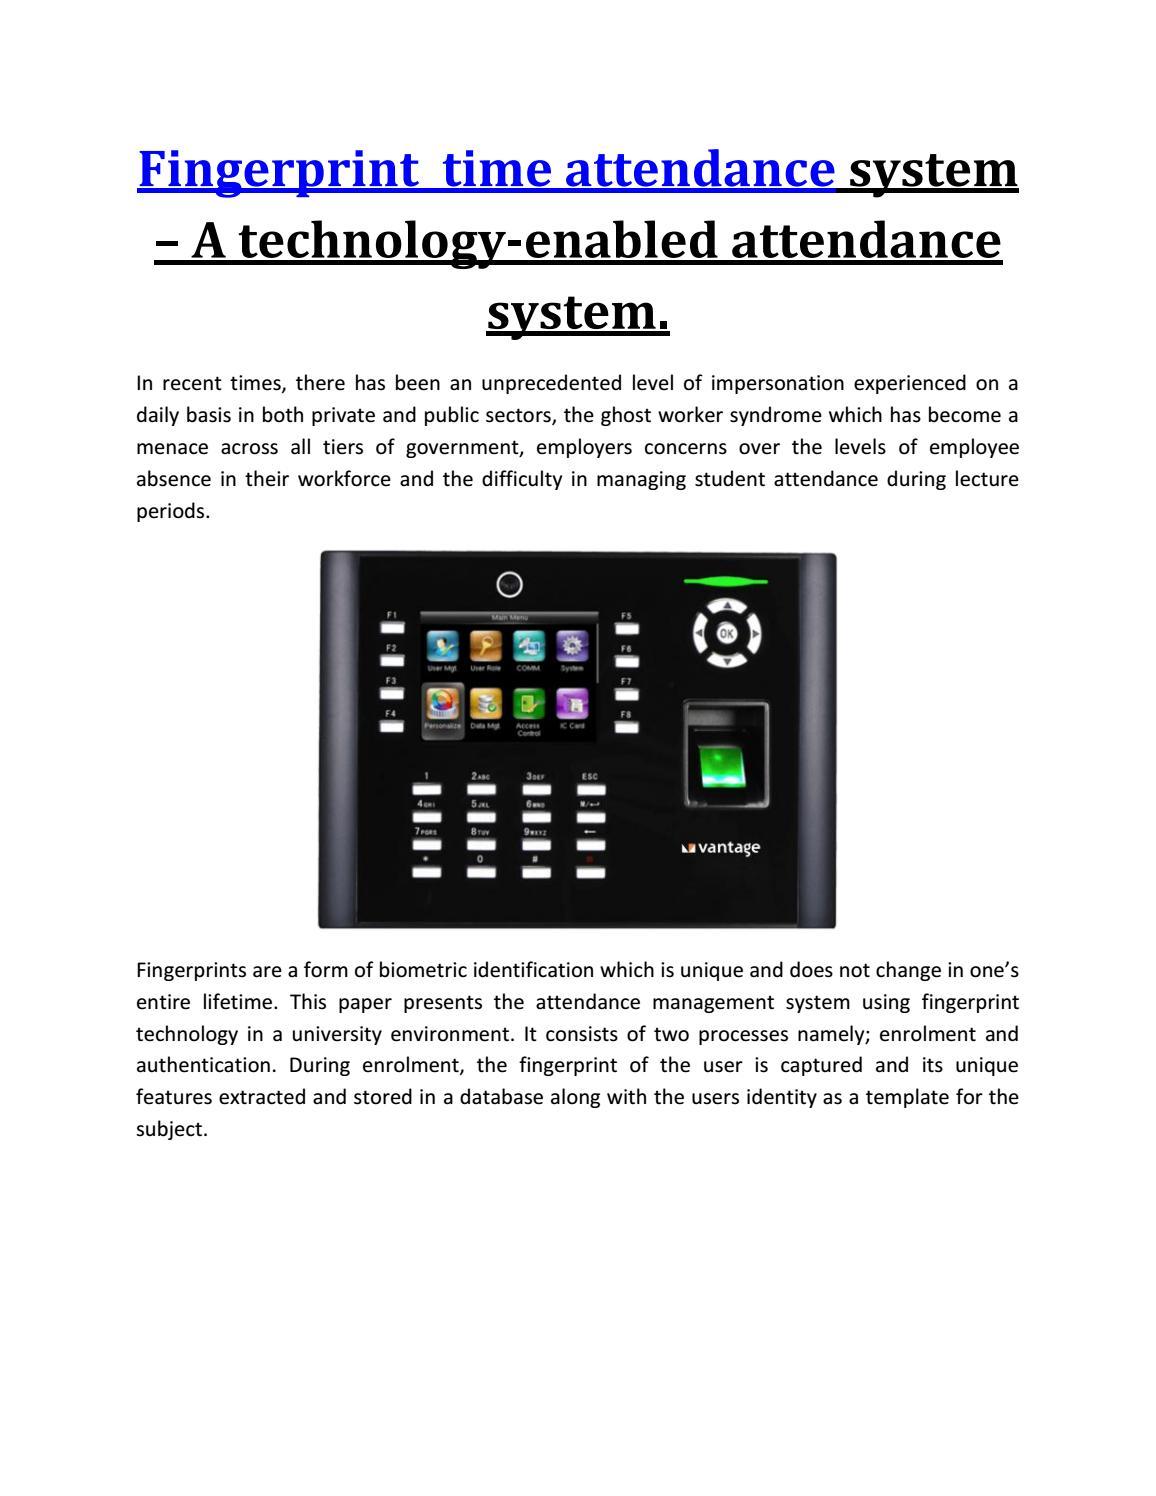 Fingerprint Time Attendance System A Technology Enabled Attendance